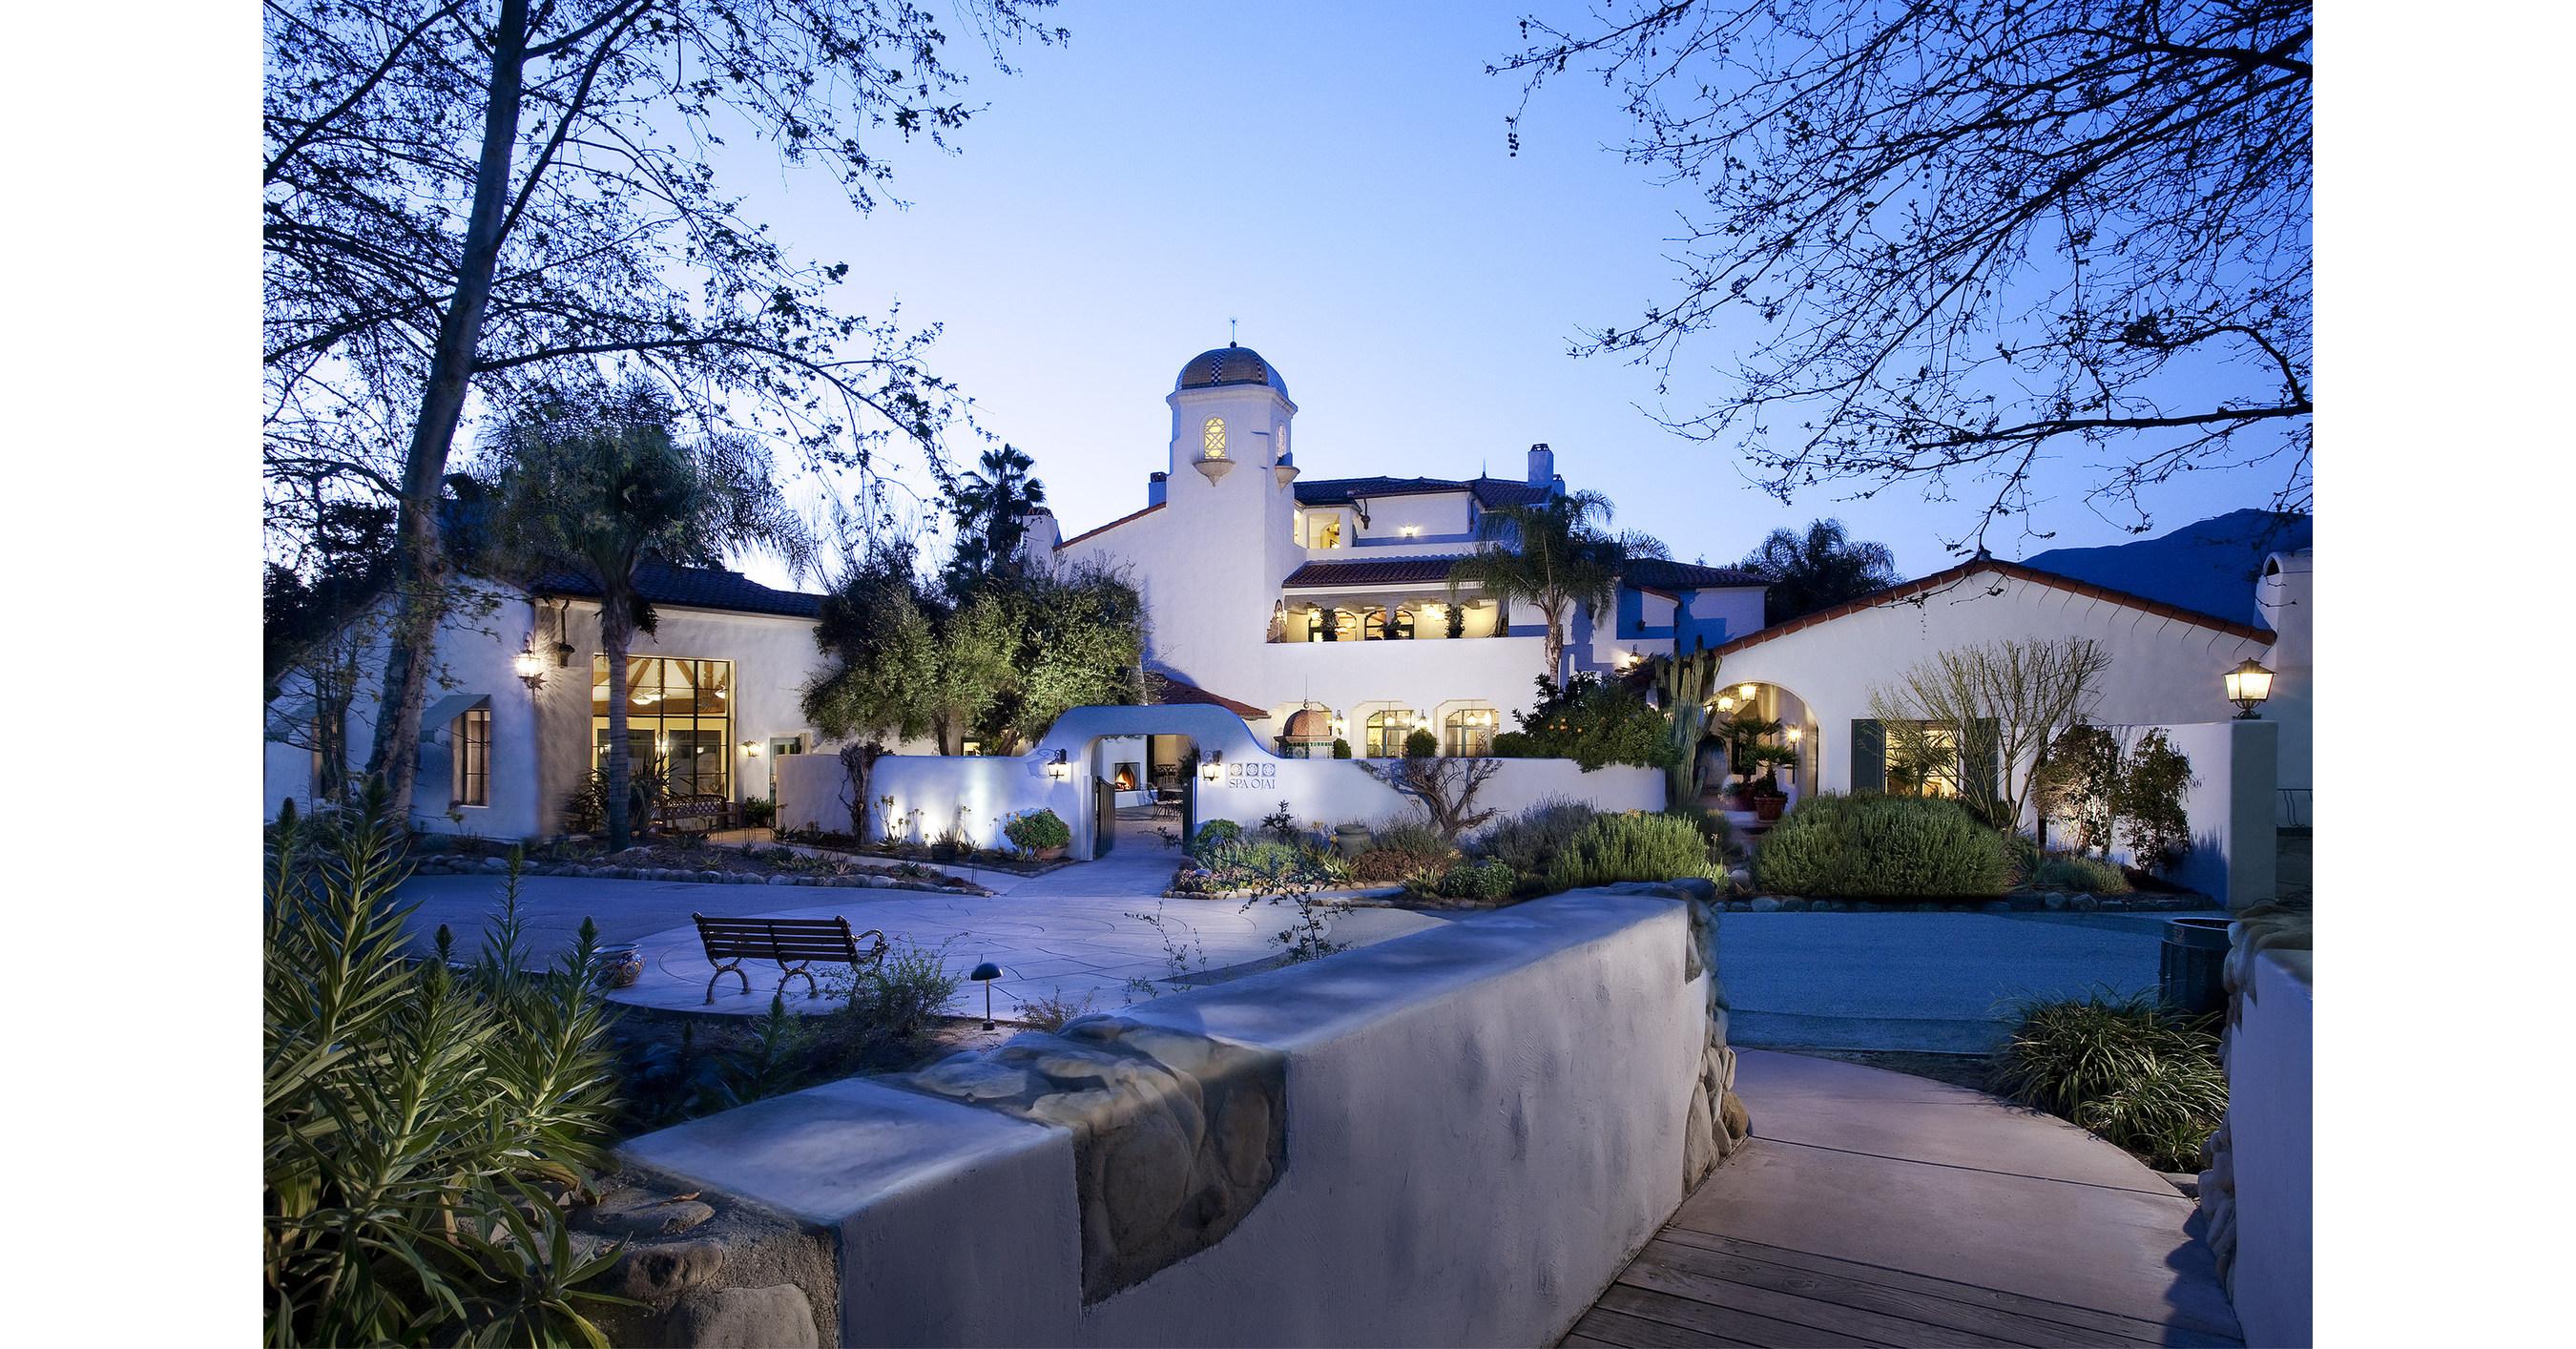 Luxury Hotels Ojai Valley Inn Spa: Ojai Valley Inn & Spa Unveils Single Use Plastic-Free